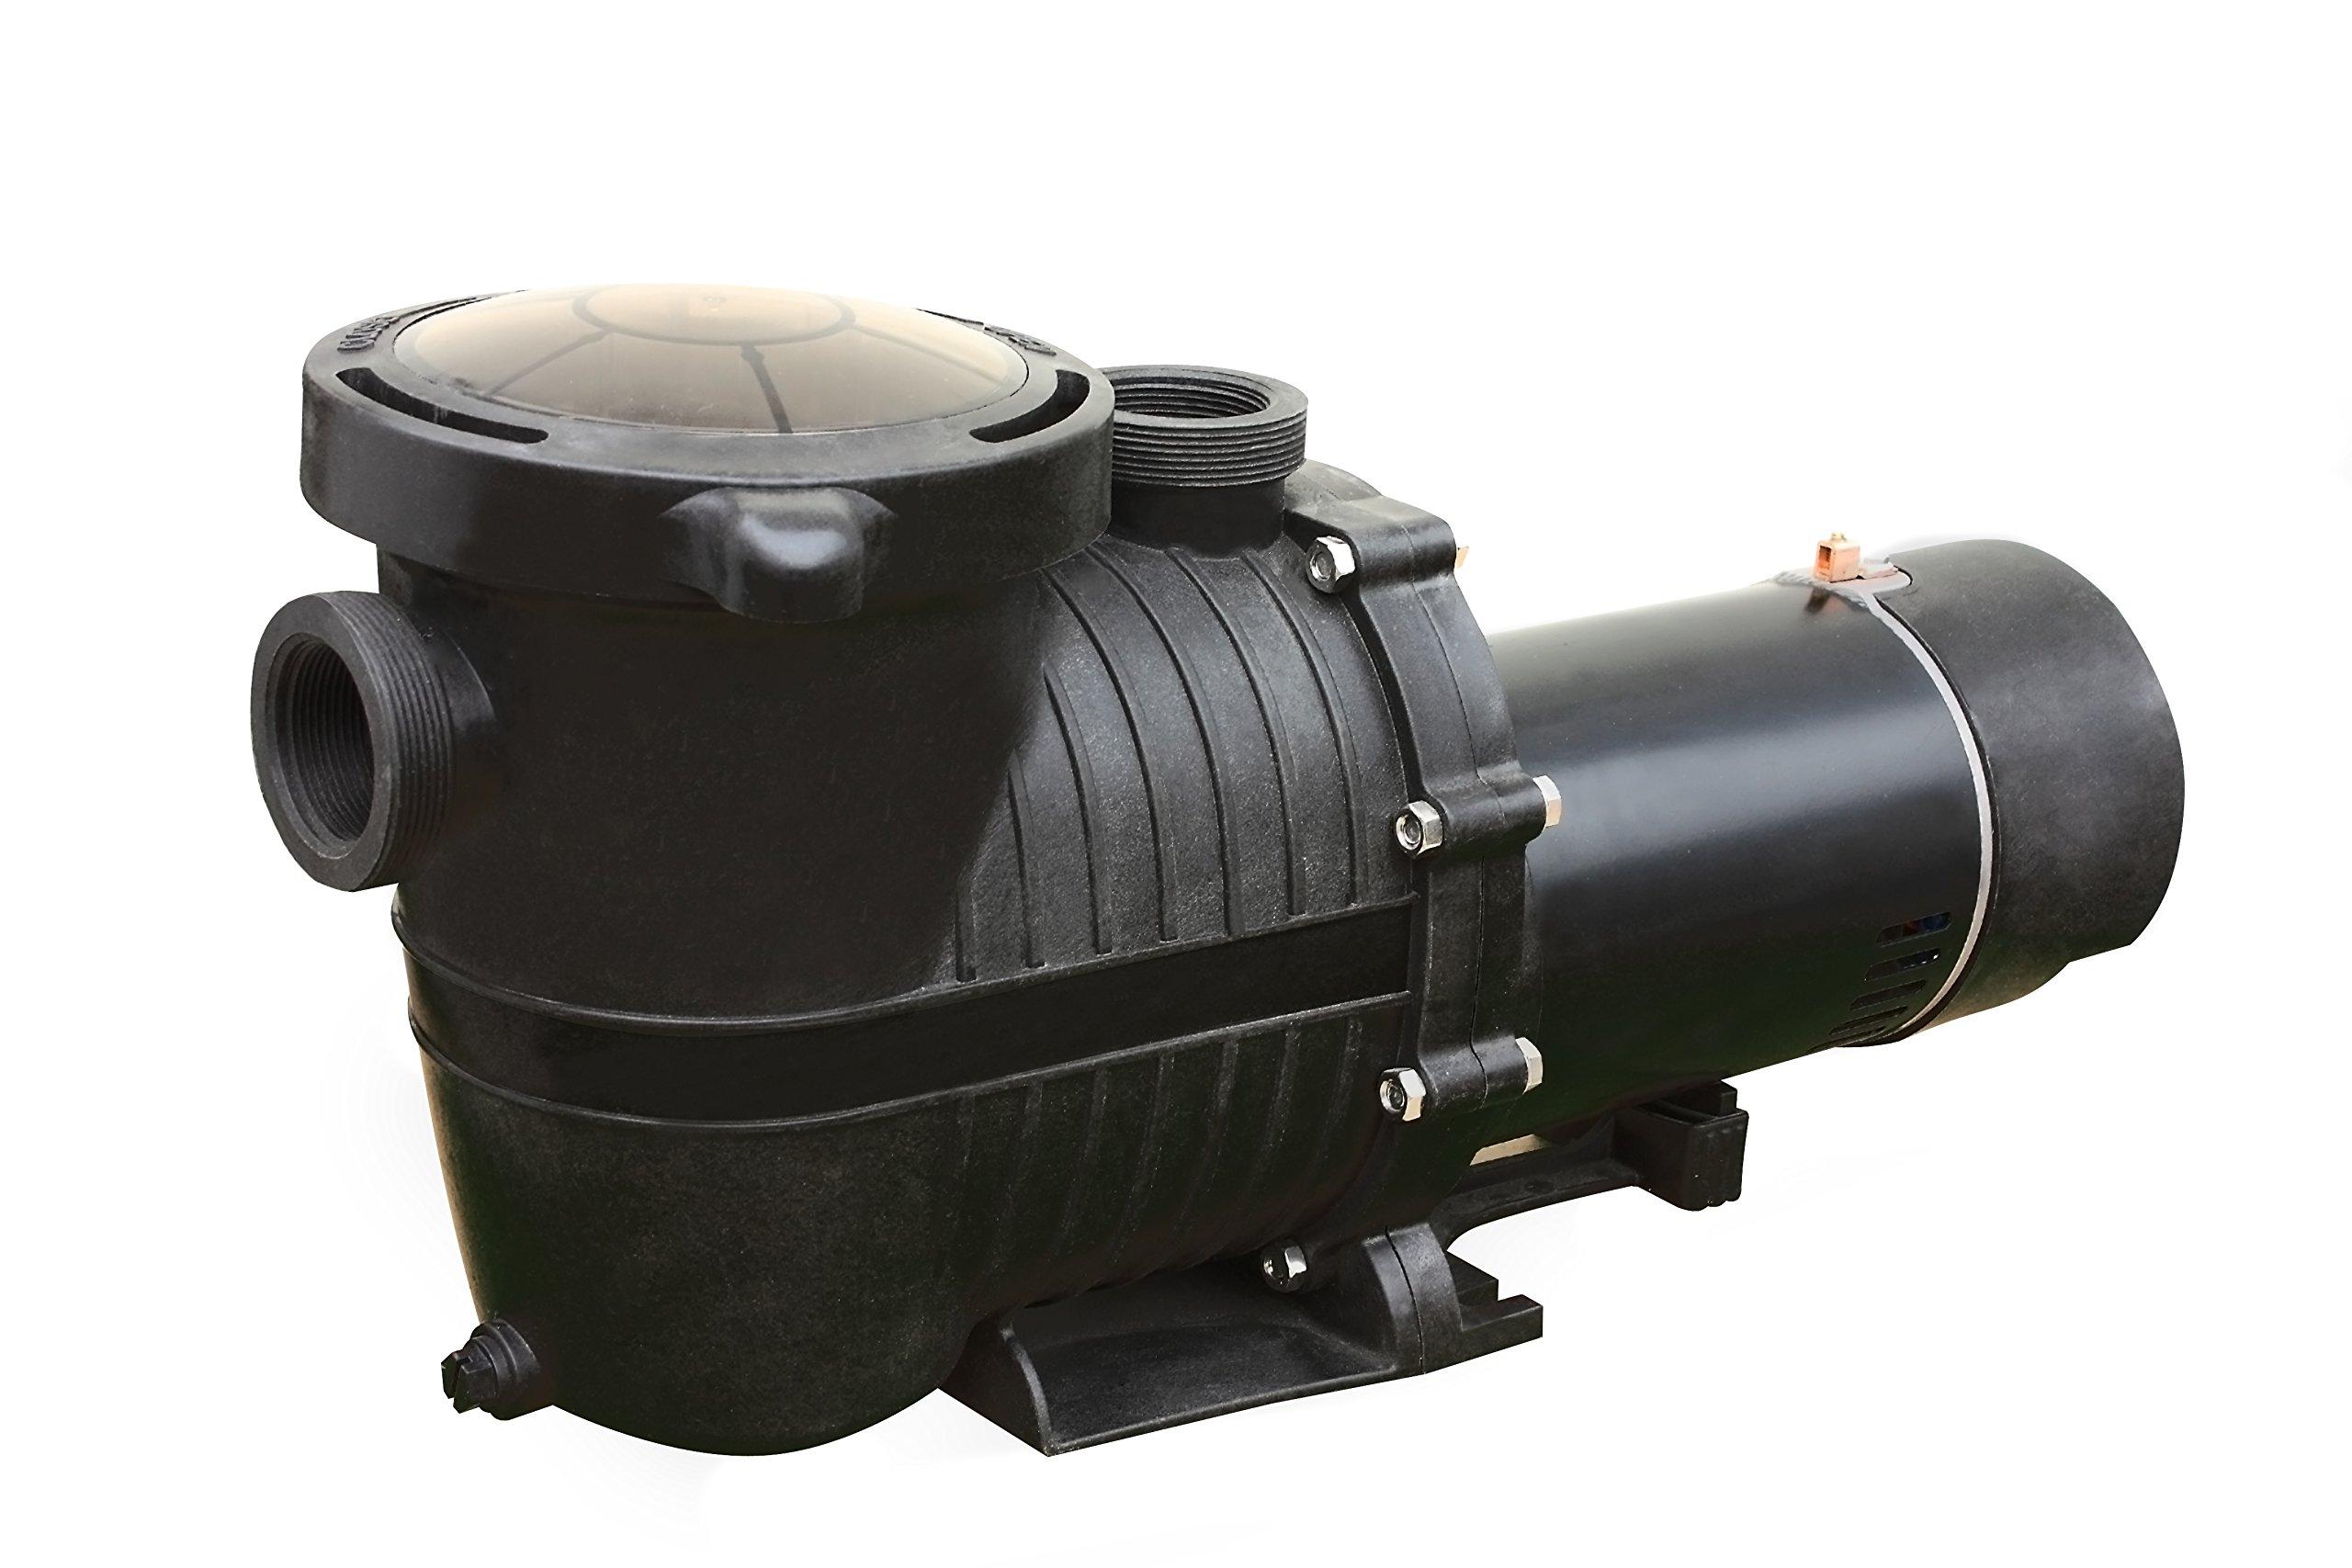 FlowXtreme NE4520 2-Speed in-Ground Pool Pump w/Copper Windings, 1 HP/2280-5040 GPH/230V, Black by FlowXtreme